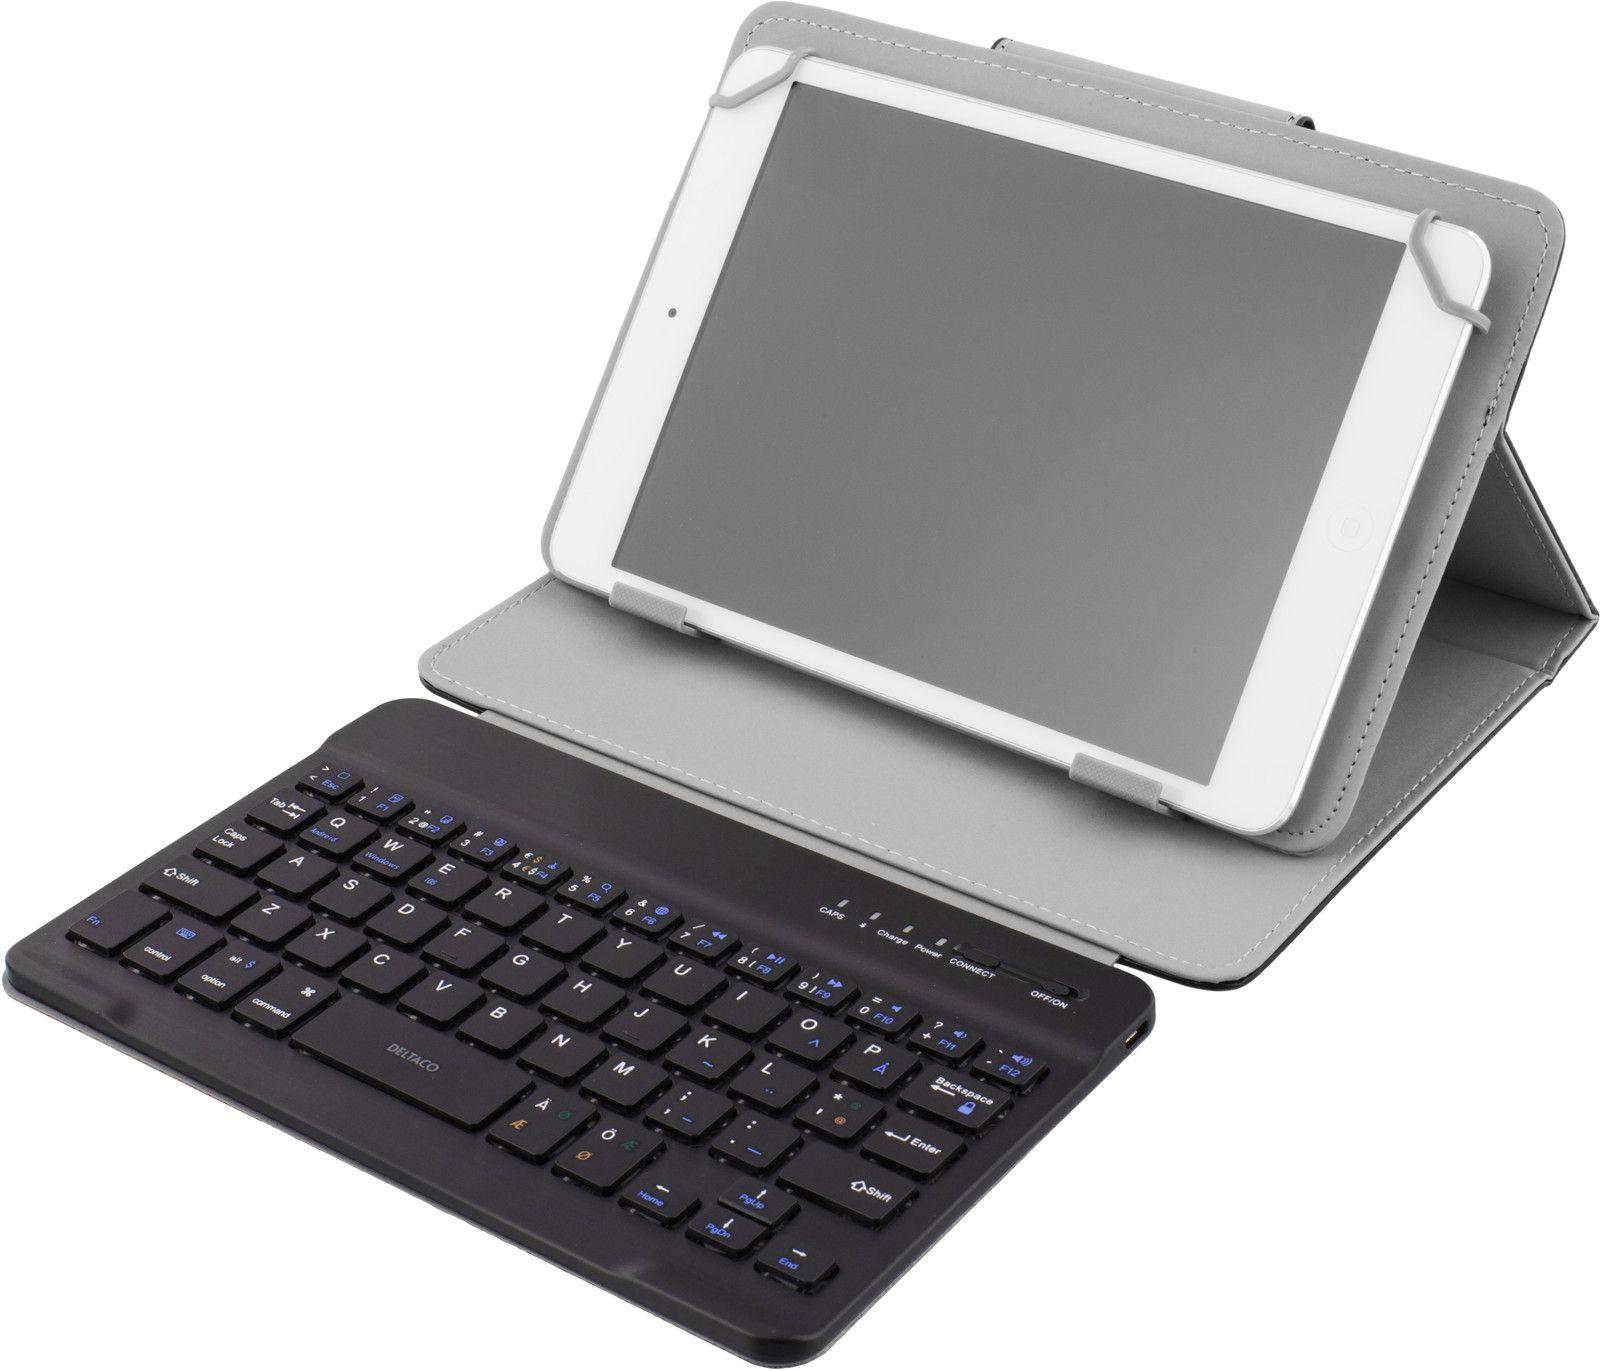 Deltaco Fodral med Tangentbord - Fodral - iPad mini - iPhonebutiken.se 3b0b9bf1bae70